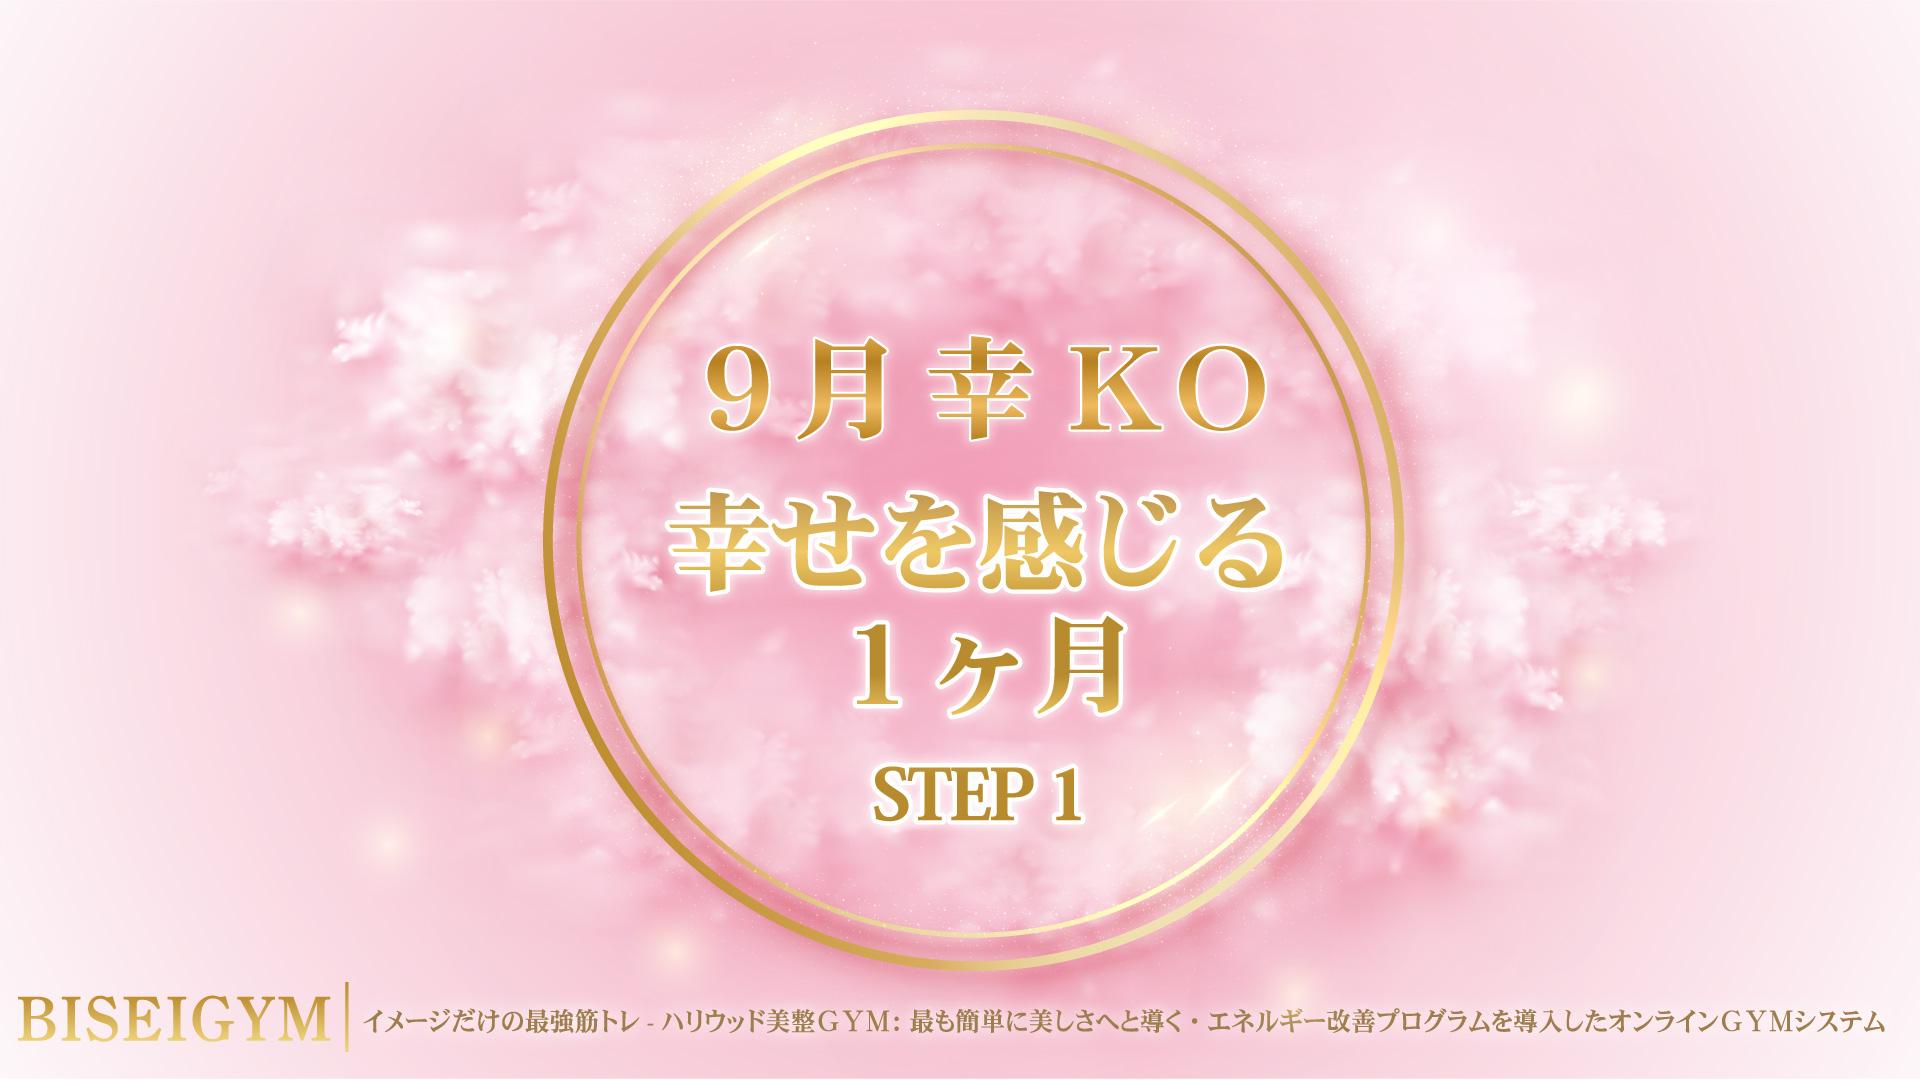 mission-title09_step1